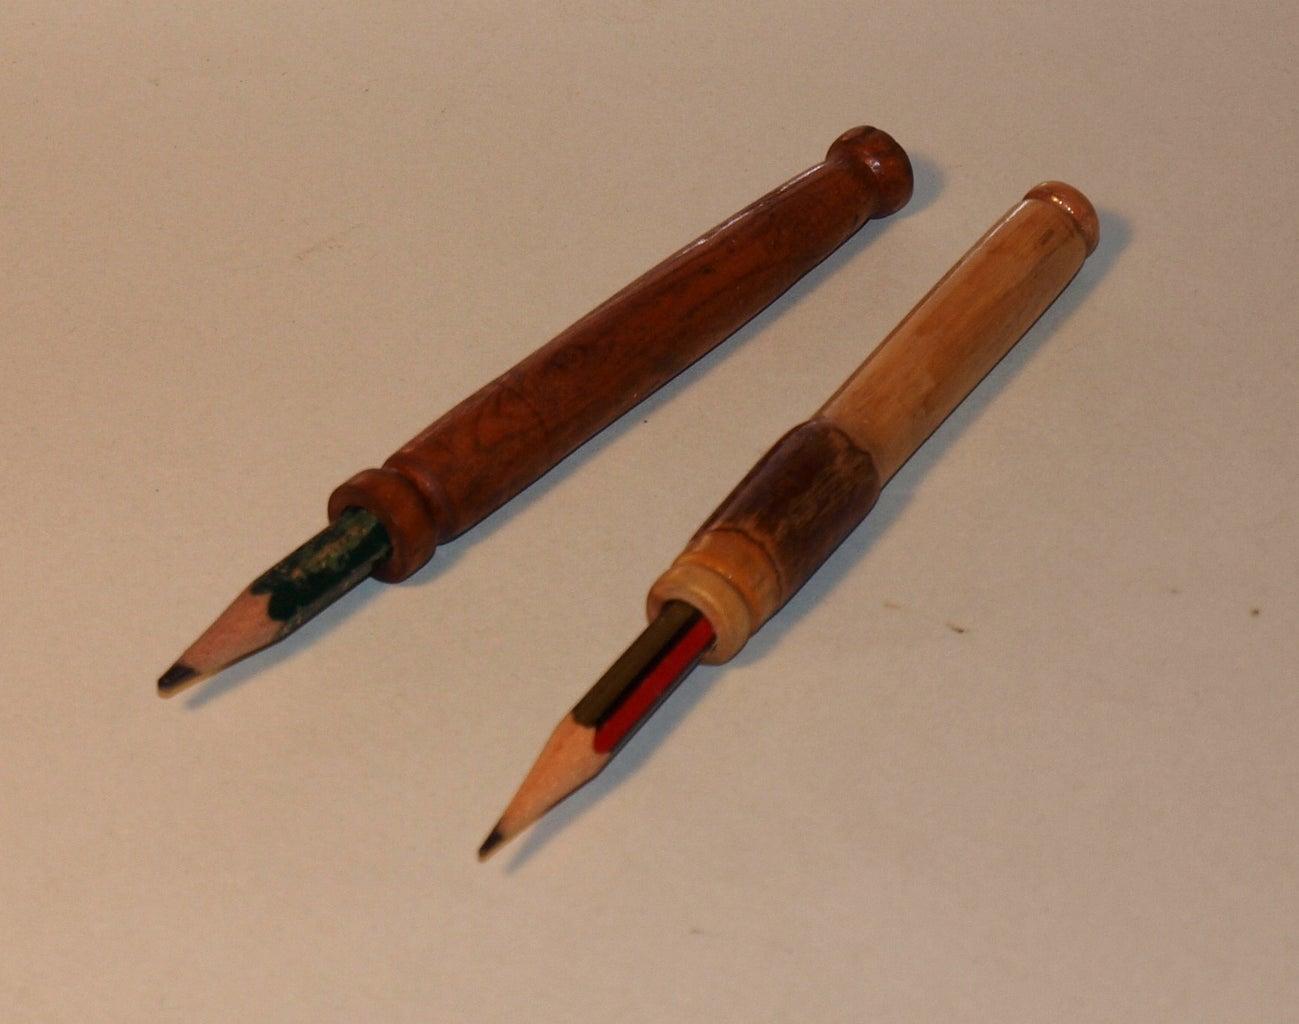 Pencil Holders